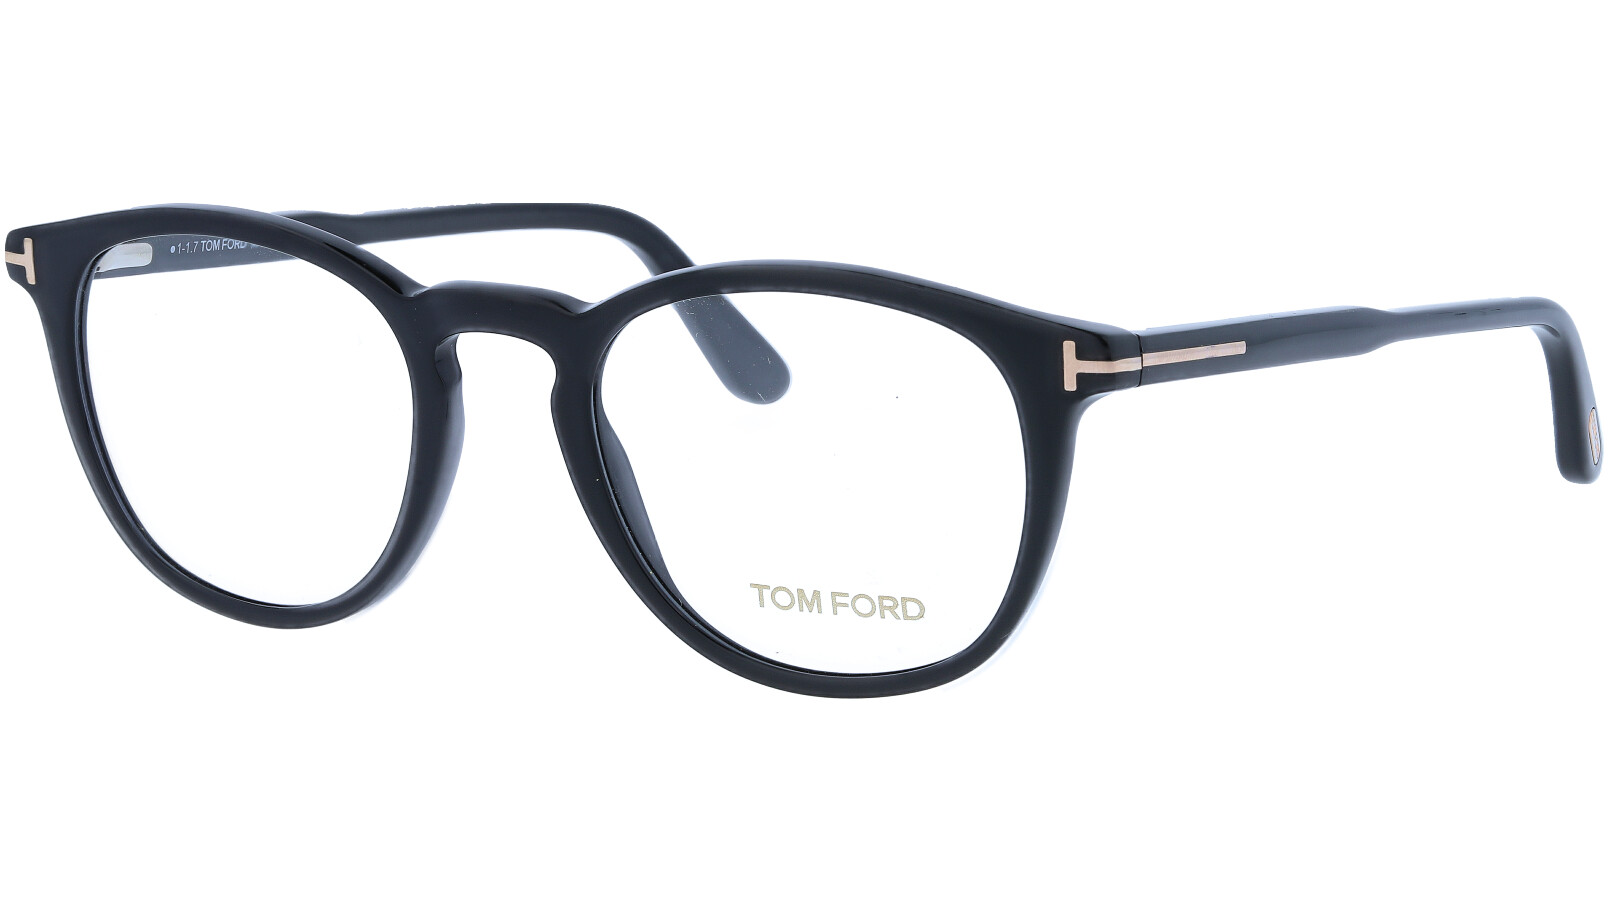 Tom Ford TF5401 001 49 Black Glasses